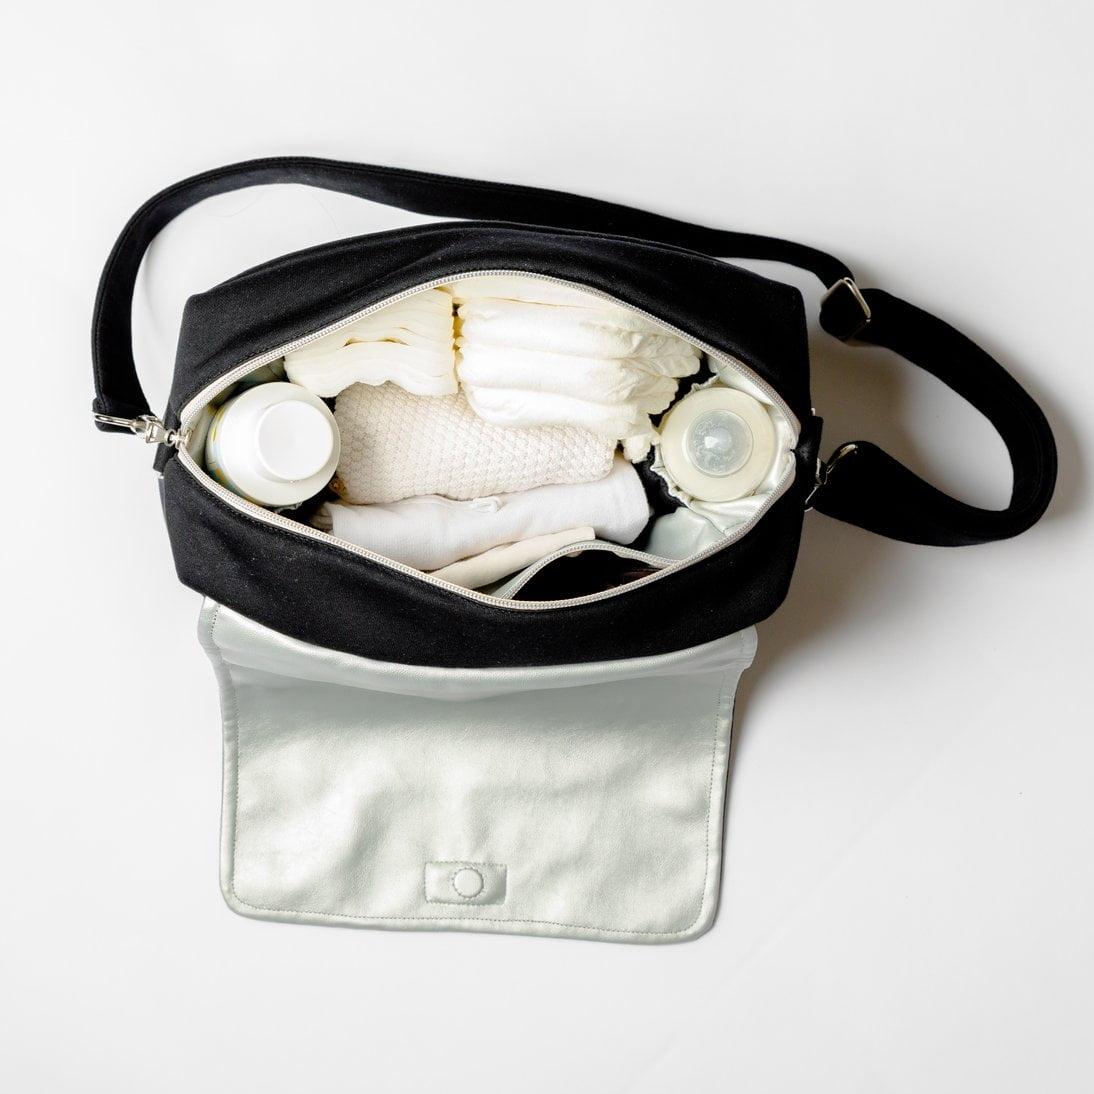 Previjalna torba MINI JERSEY Grey-1981